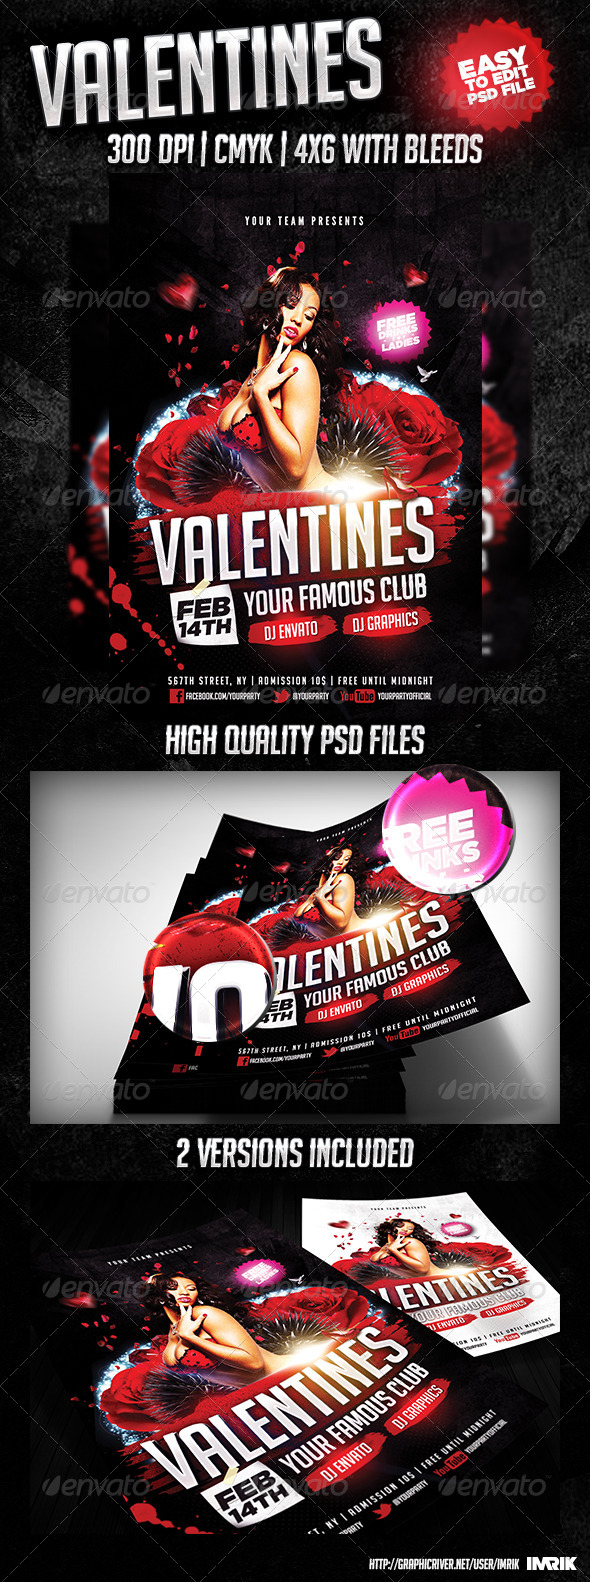 Valentines Flyer 2014